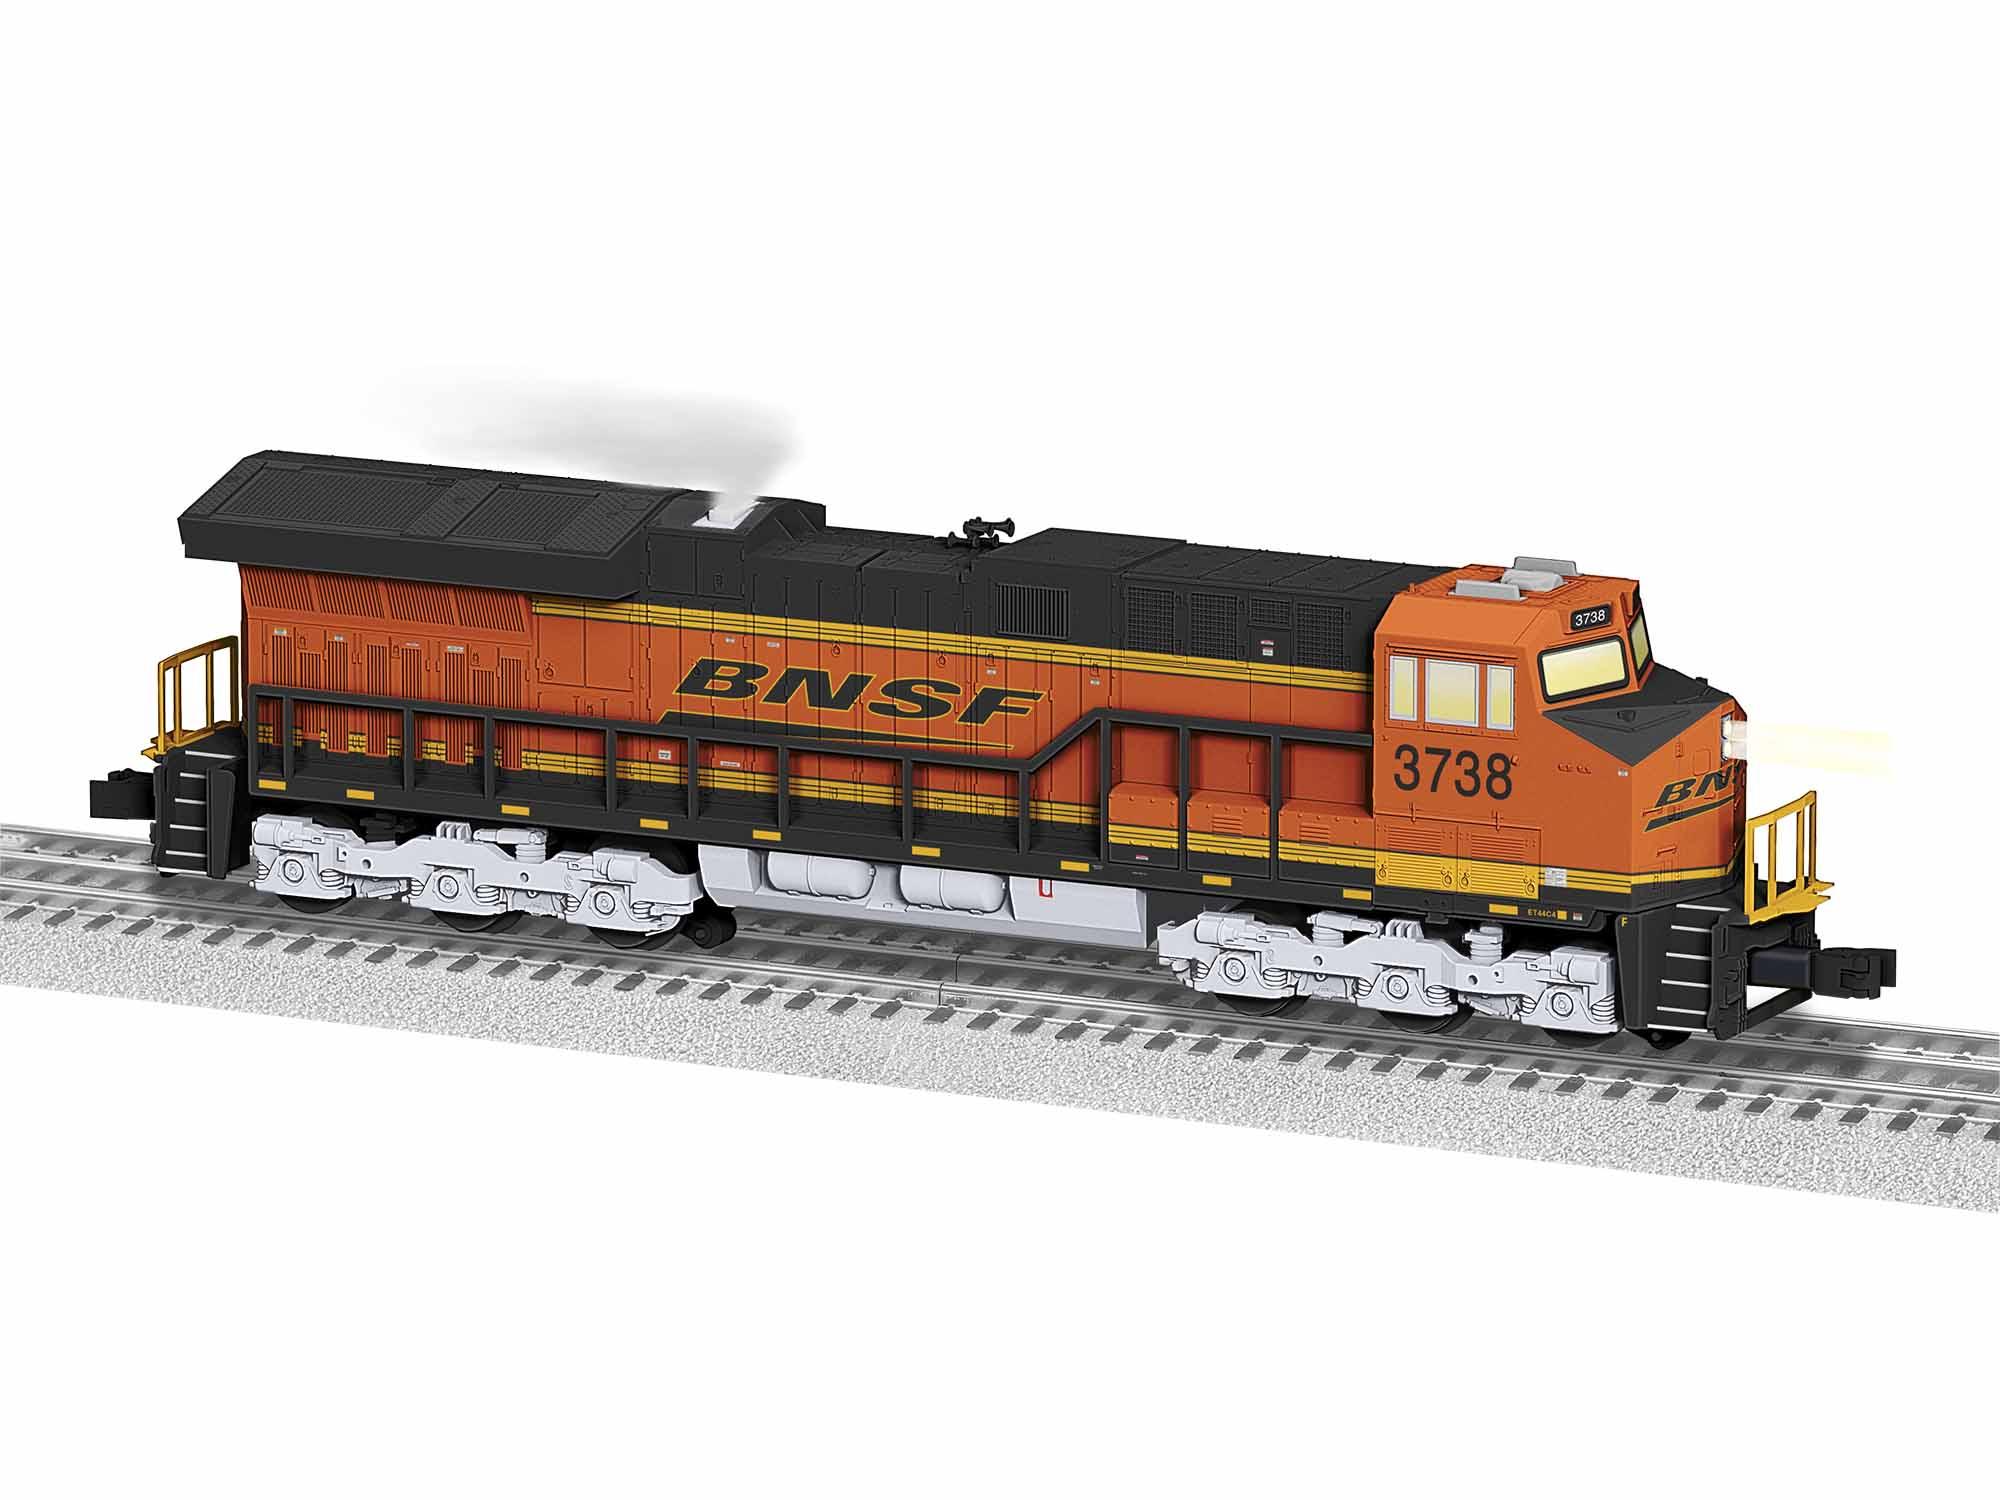 LNL1934011 Lionel O-31 ET44AC, BNSF #3738